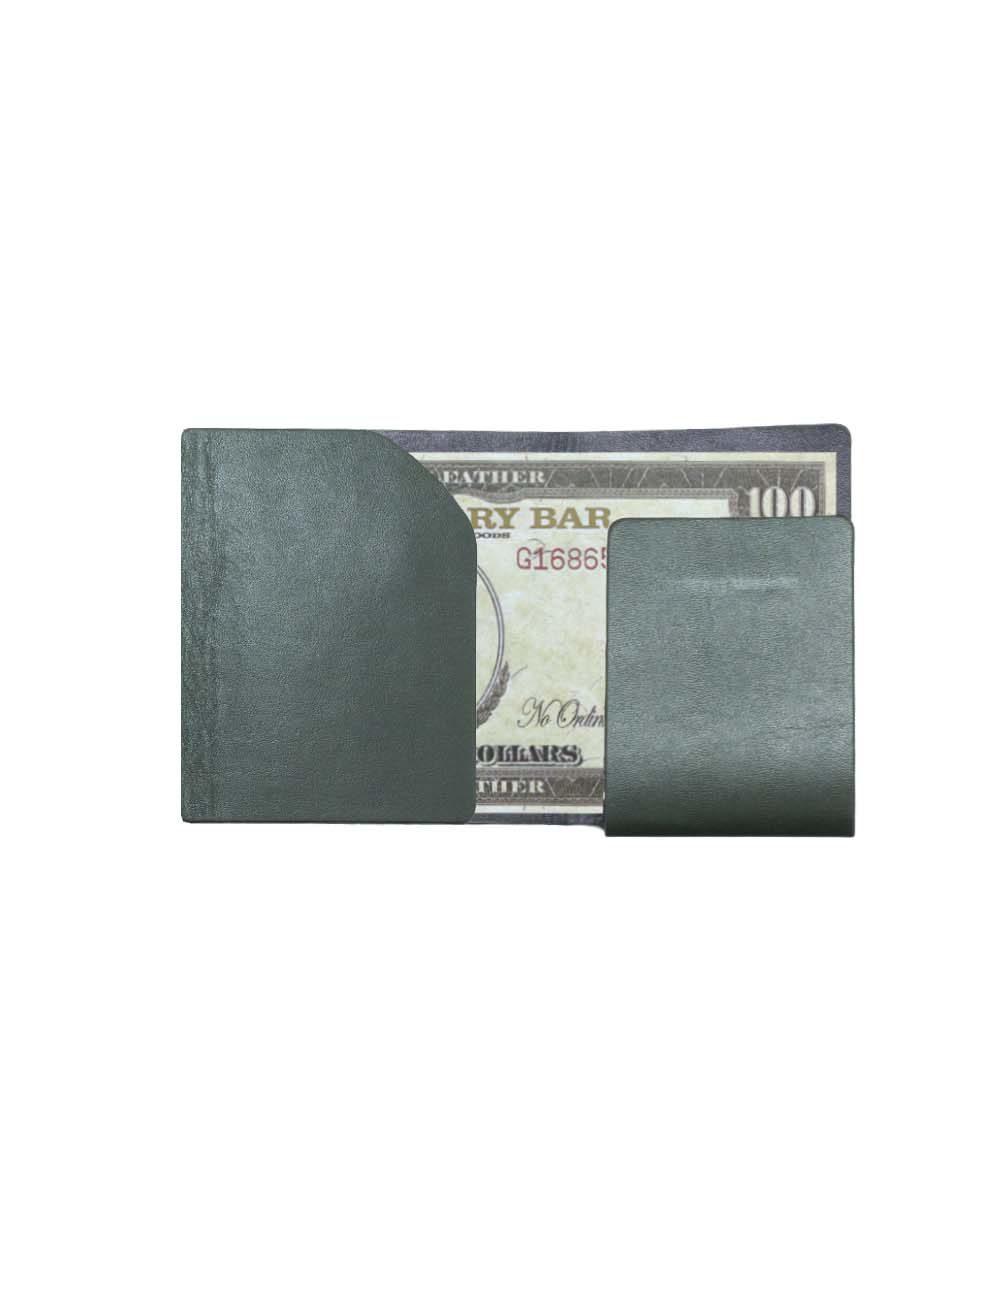 Dark Olive Green 100% Genuine Top Grain Leather Money Fold SLG6.NOB1